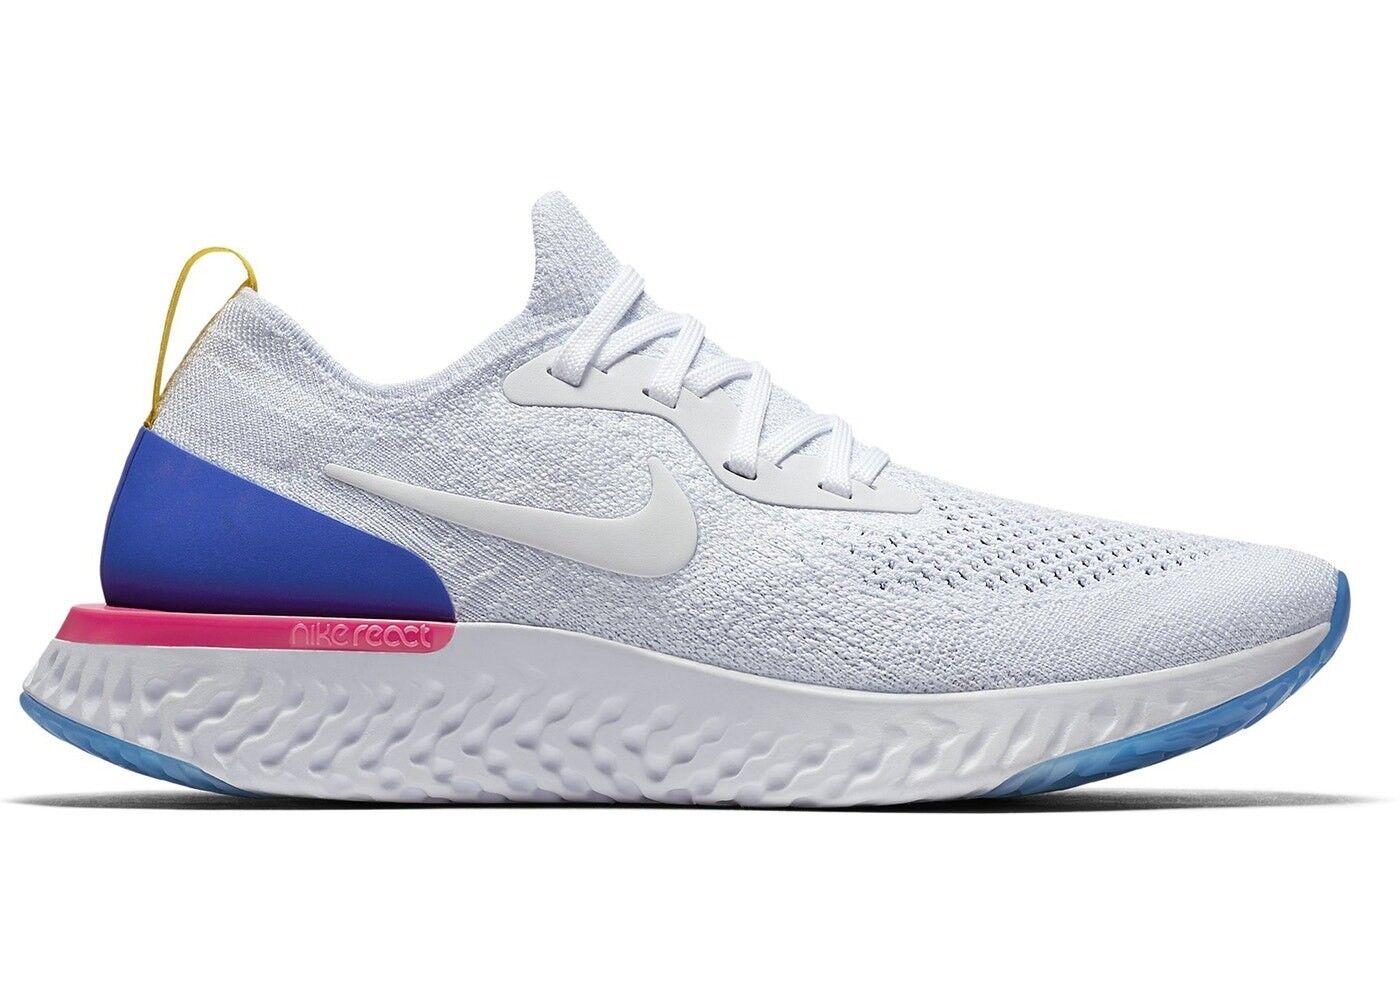 RARE Size    Men's Nike Flynit React - Size 12.5 - White Racer bluee Pink Blast